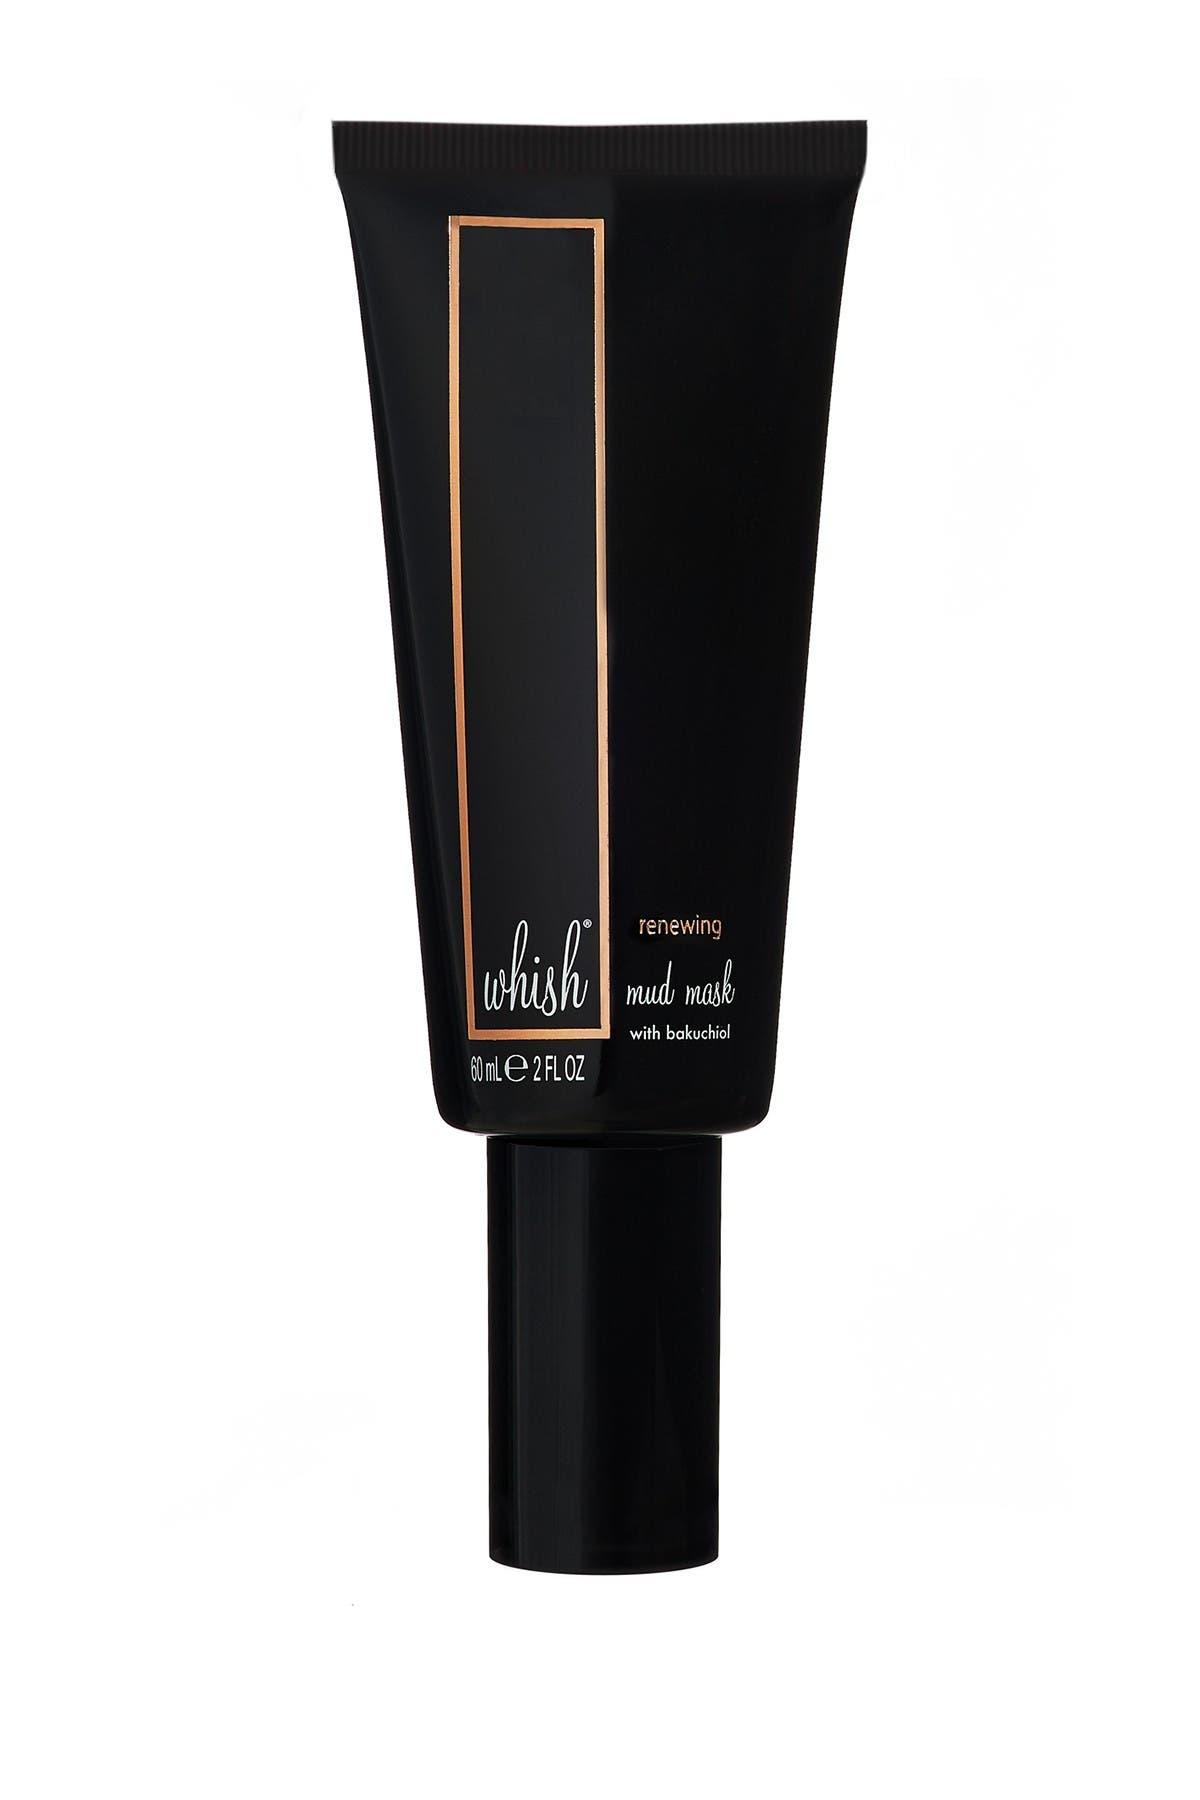 Image of Whish Renewing Mud Mask with Bakuchiol - 2 fl oz